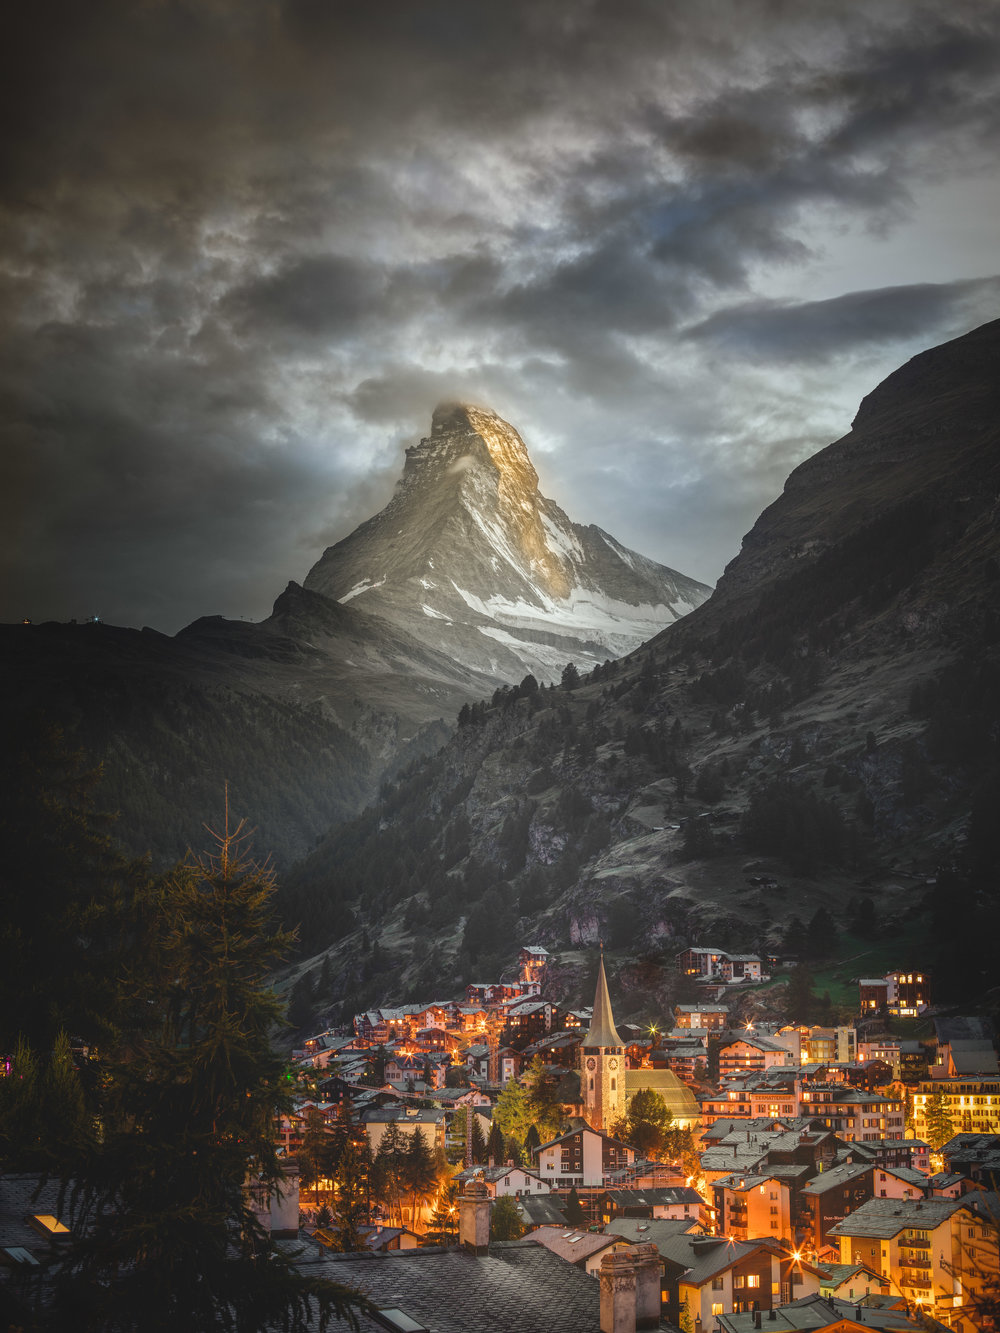 Matterhorn - Cervin, Switzerland